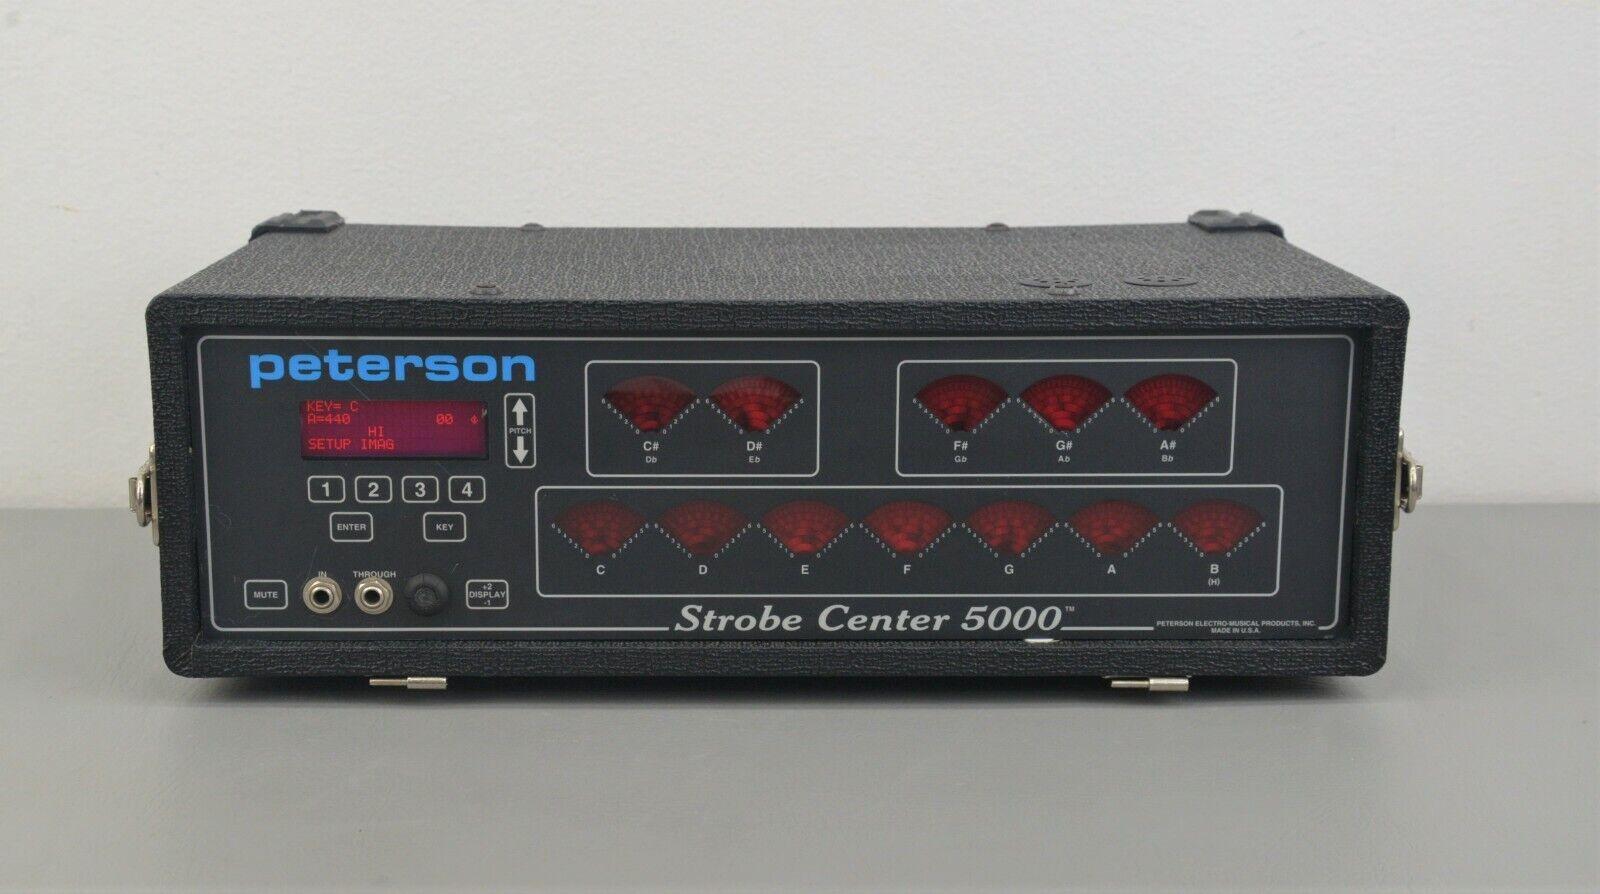 Peterson Strobe Center 5000 12 Wheel Strobe Tuner Device w/ Stretch Tuning (Used - 1495 USD)